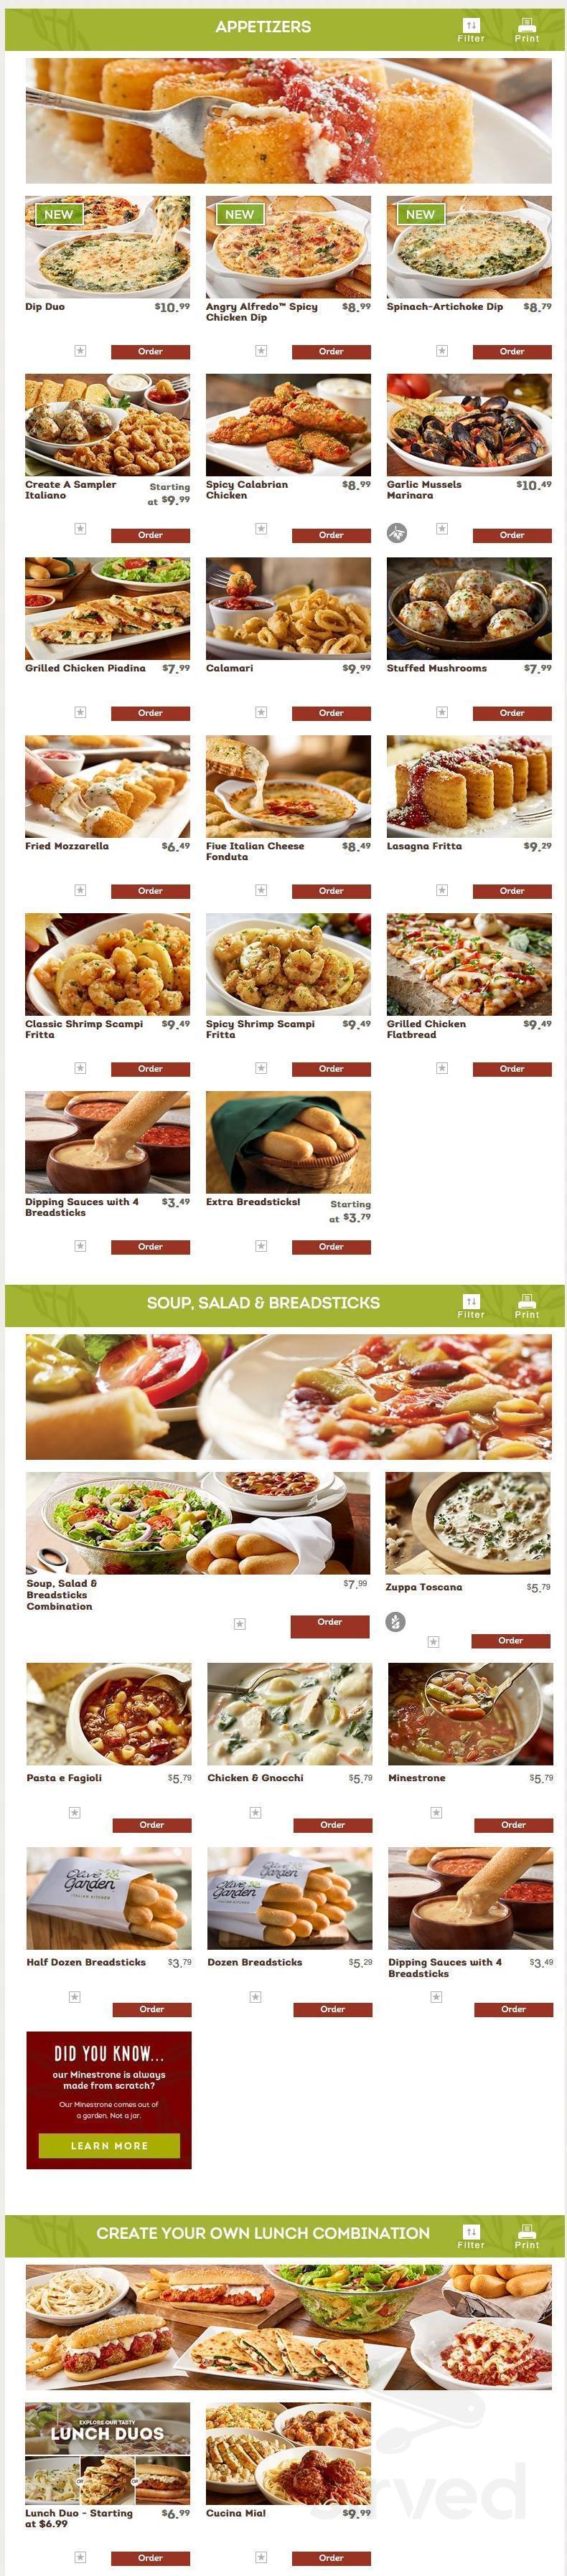 Olive Garden Italian Restaurant Menu In Huntsville Texas